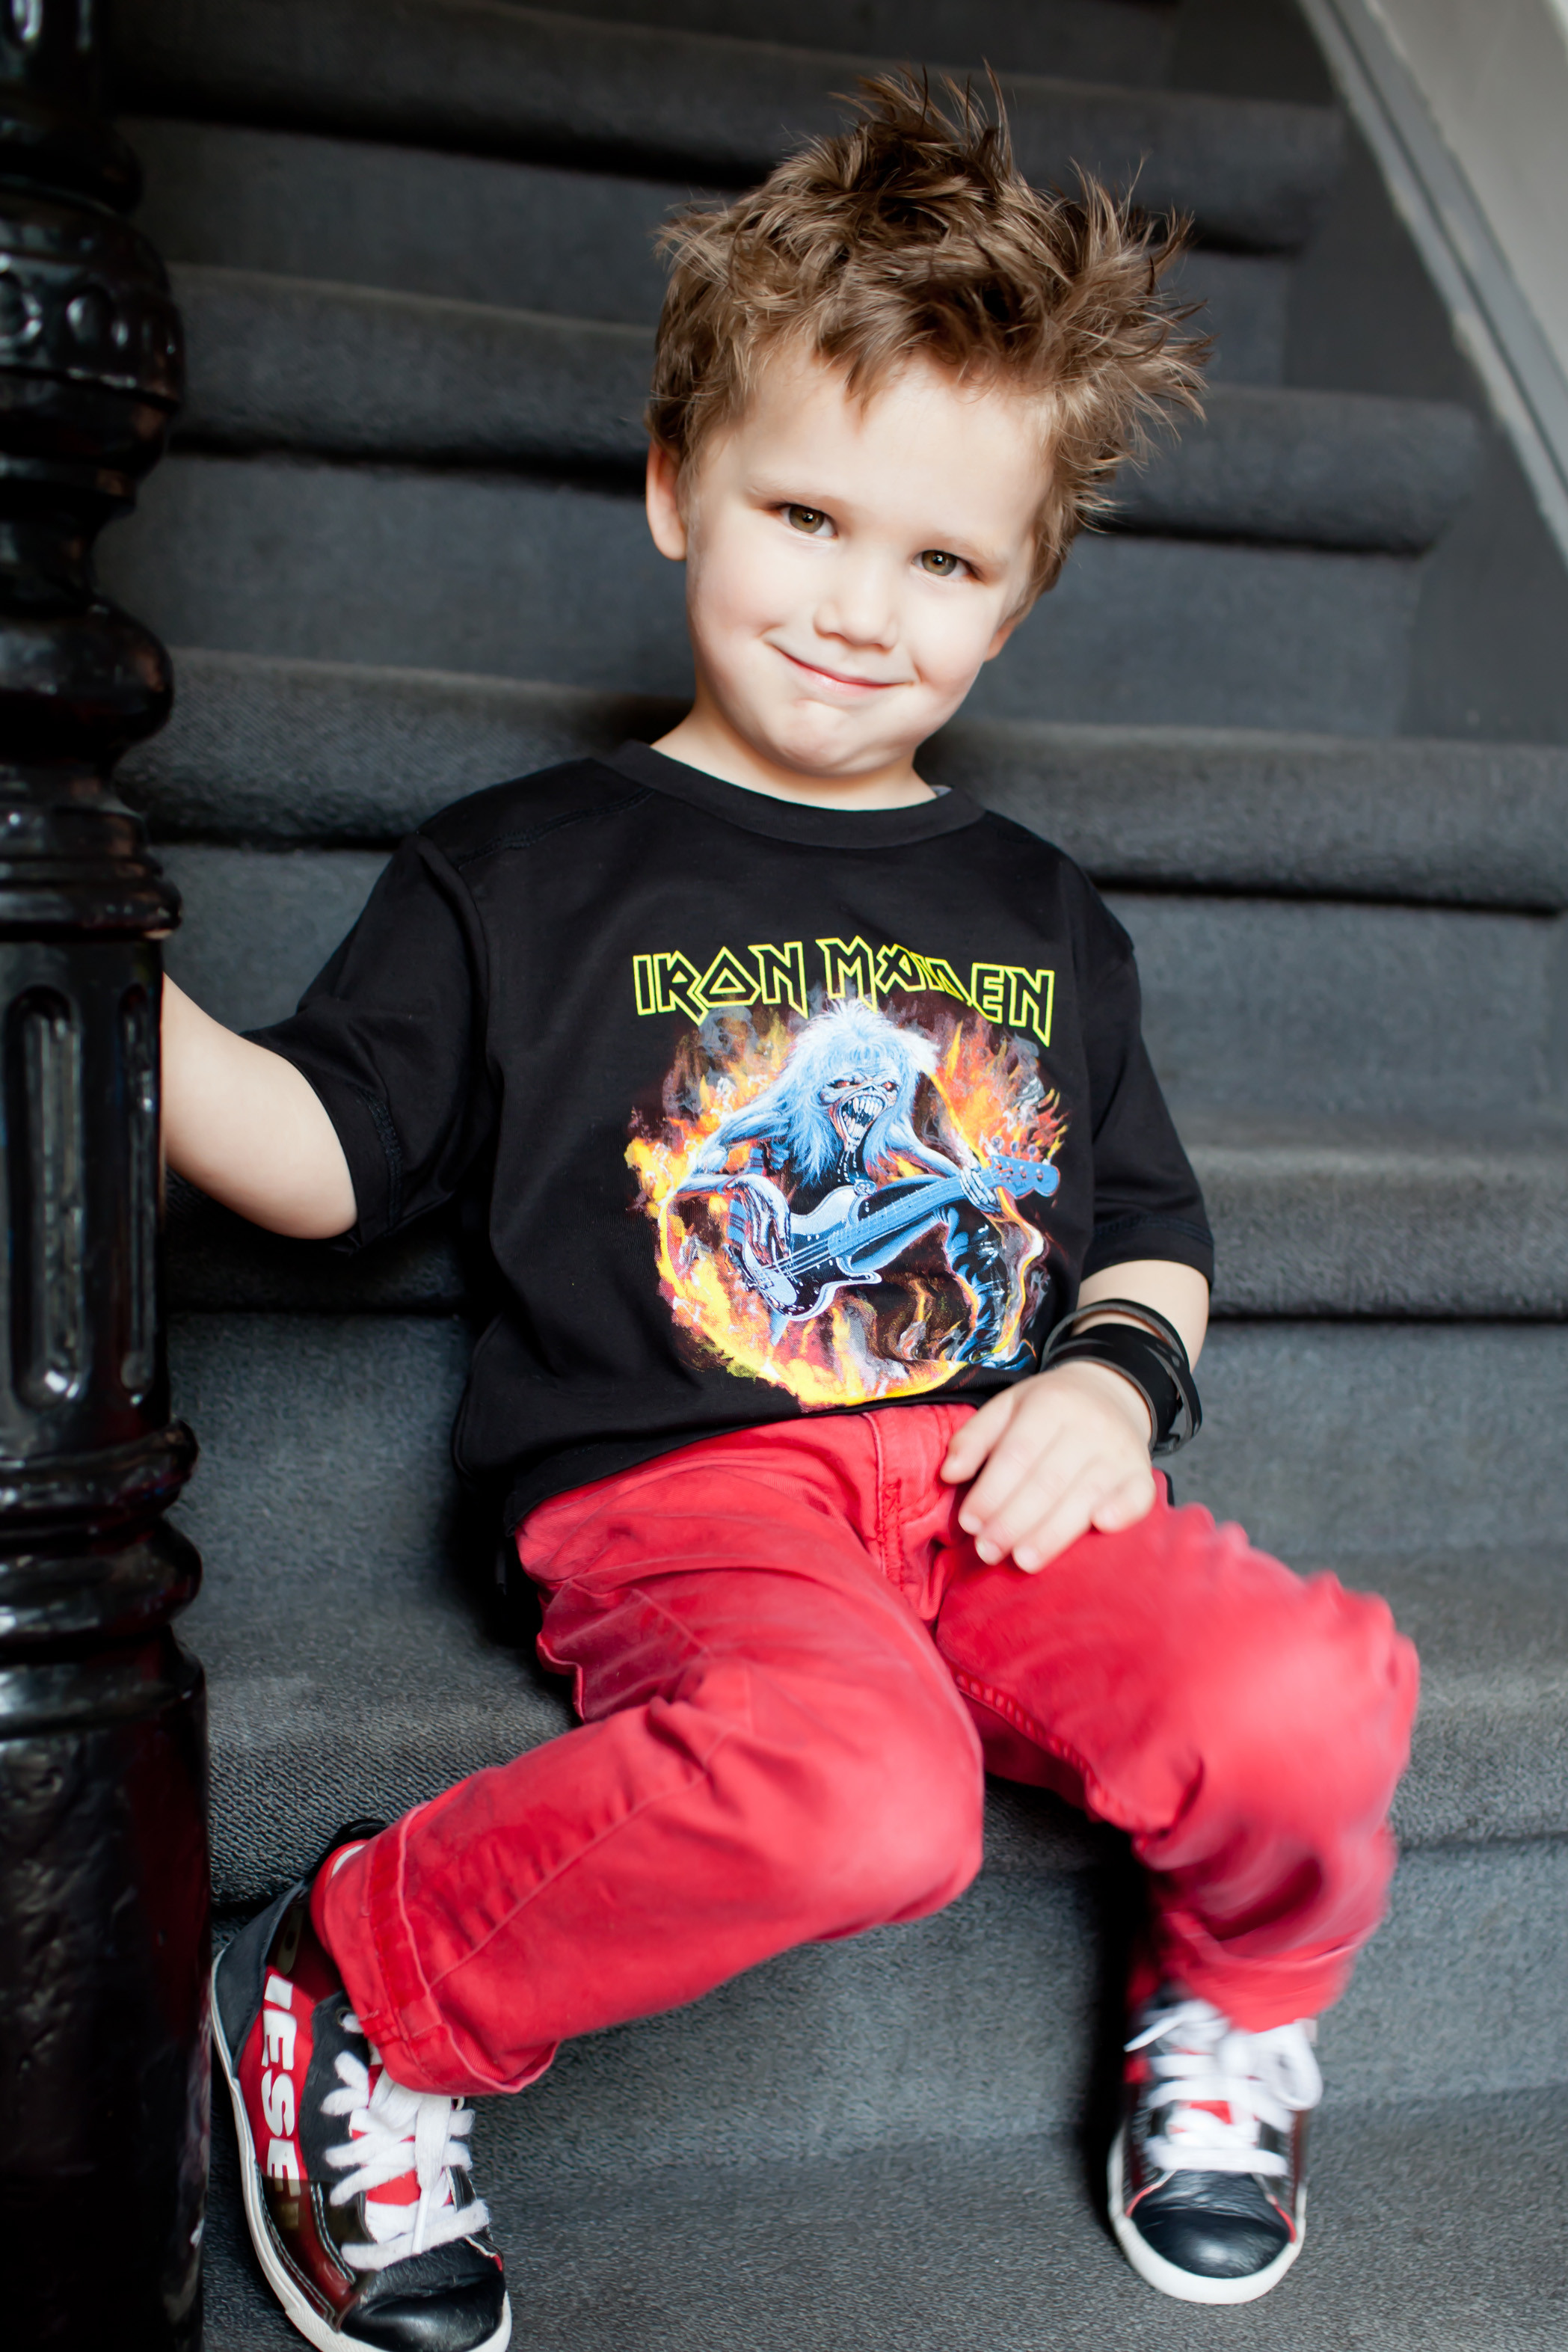 Iron Maiden kids tshirt photoshoot